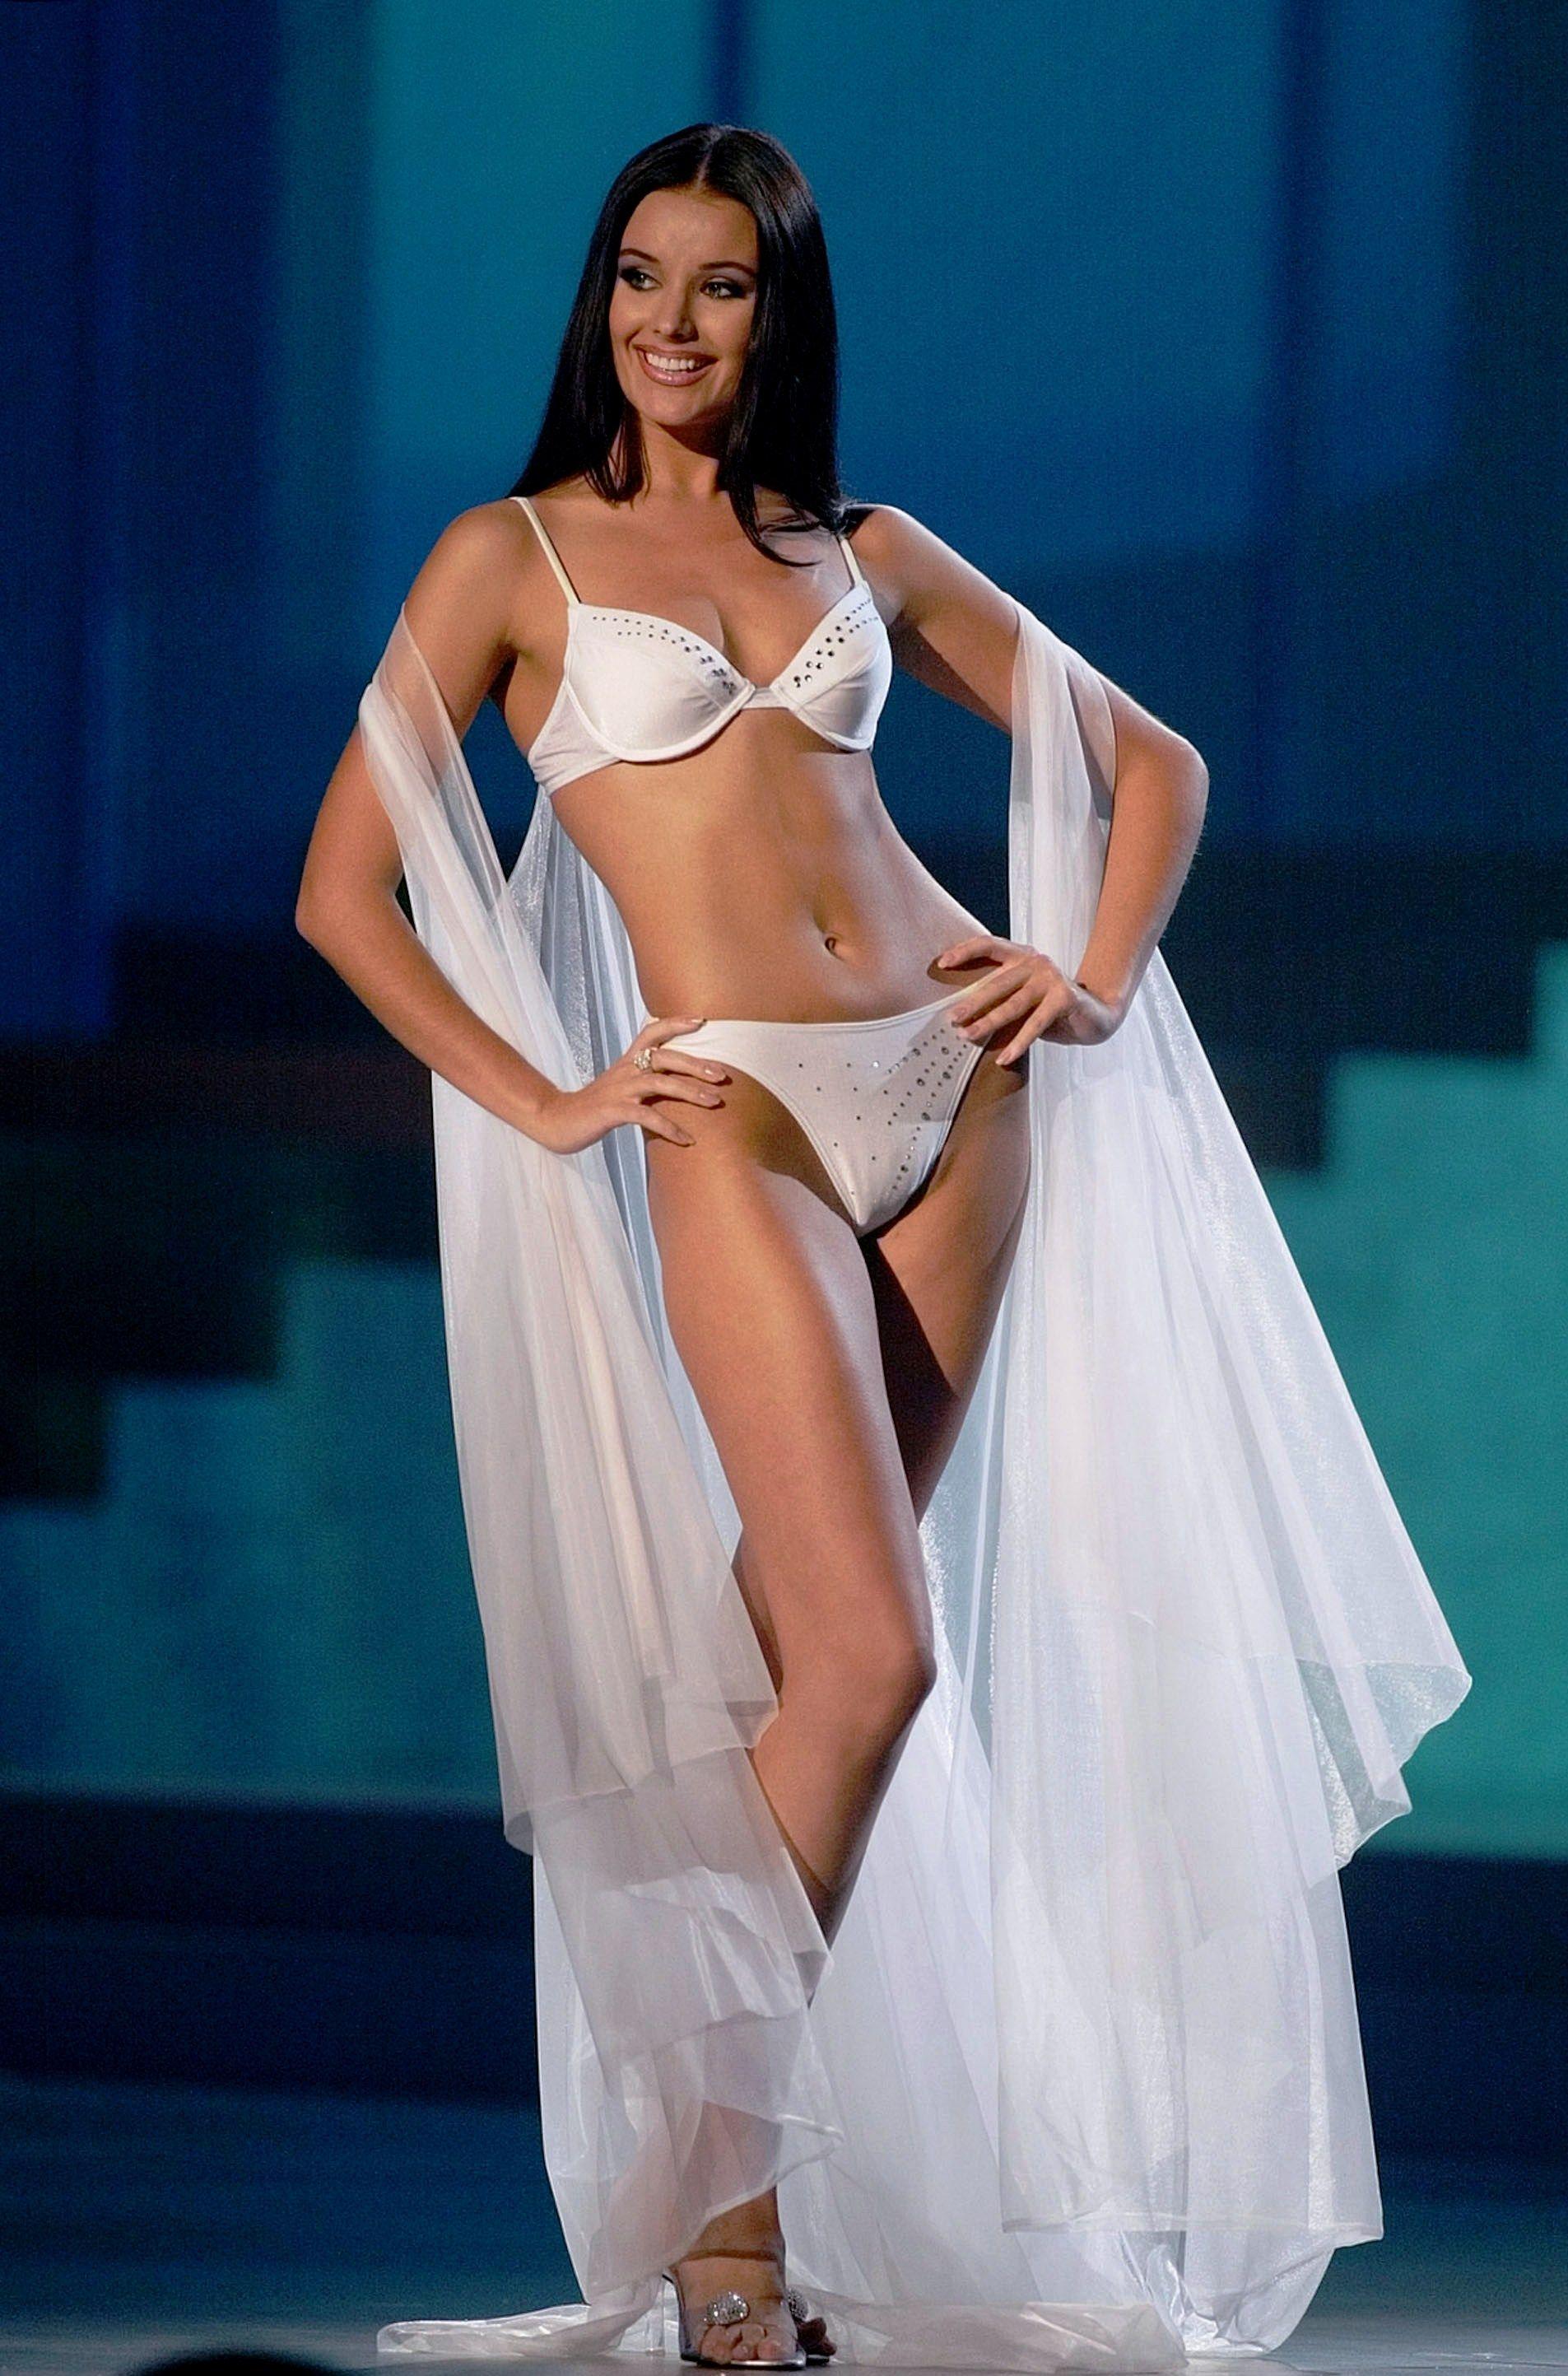 Oksana Fedorova posted hot photos in a swimsuit 11.09.2017 24